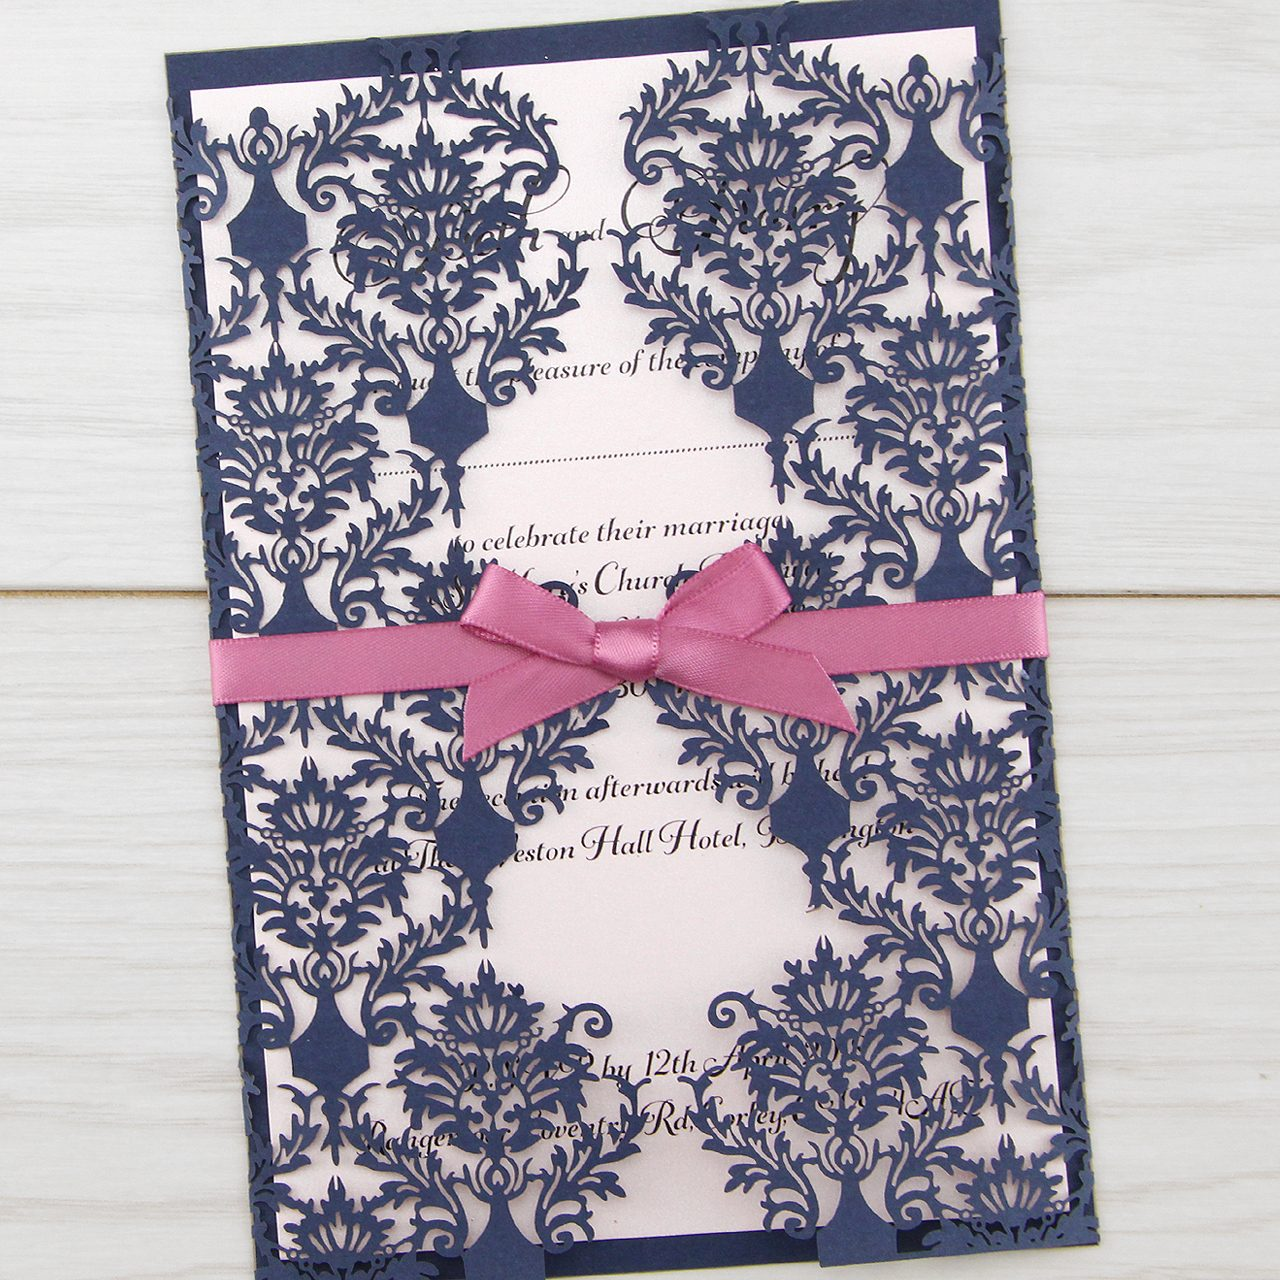 Diy wedding invitations free samples pure invitation wedding invites rosa with satin bow stopboris Image collections